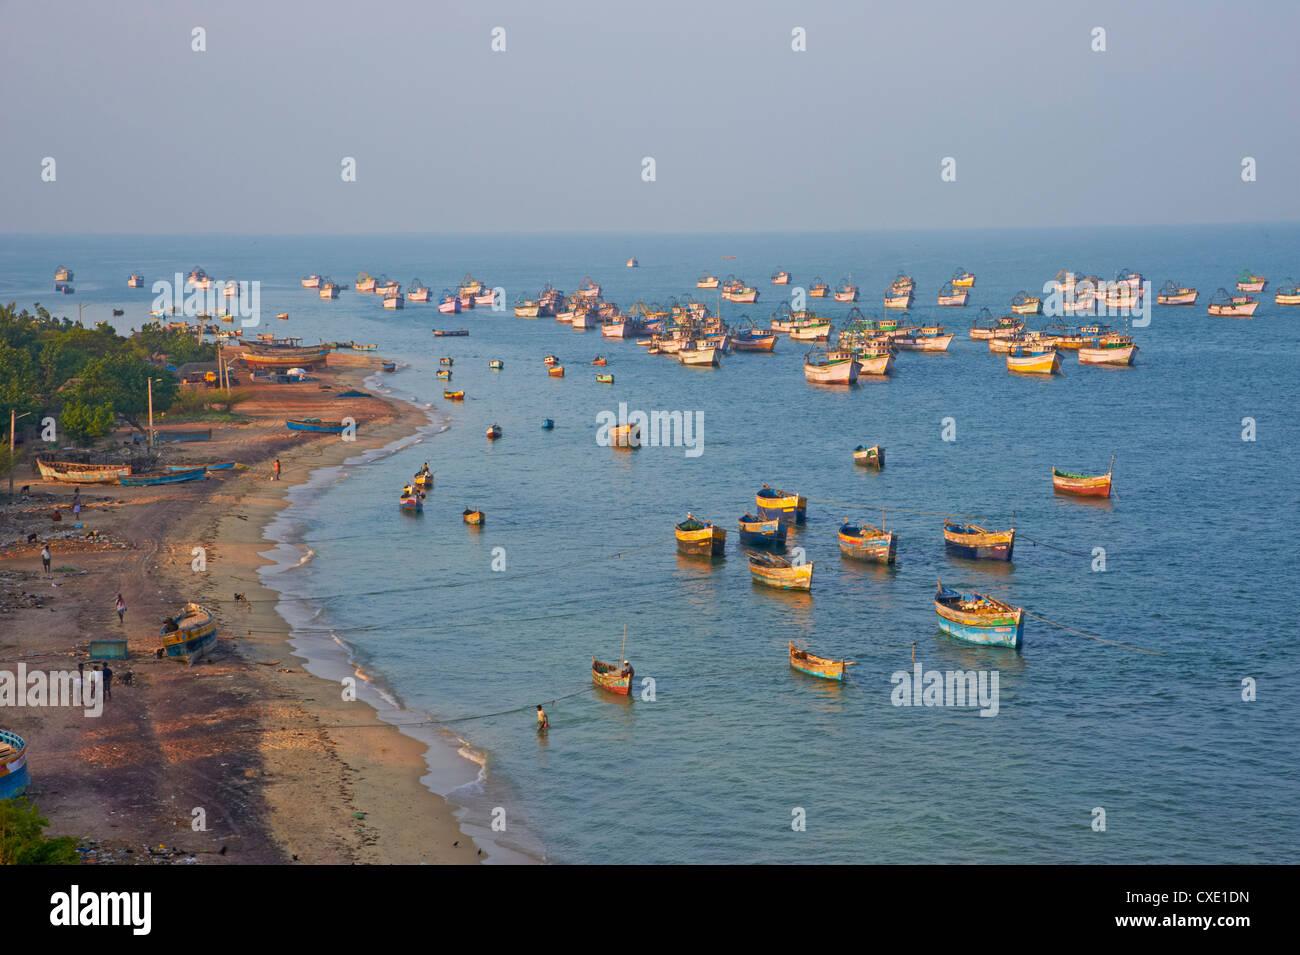 Porto di pescatori, Rameswaram, Tamil Nadu, India, Asia Immagini Stock